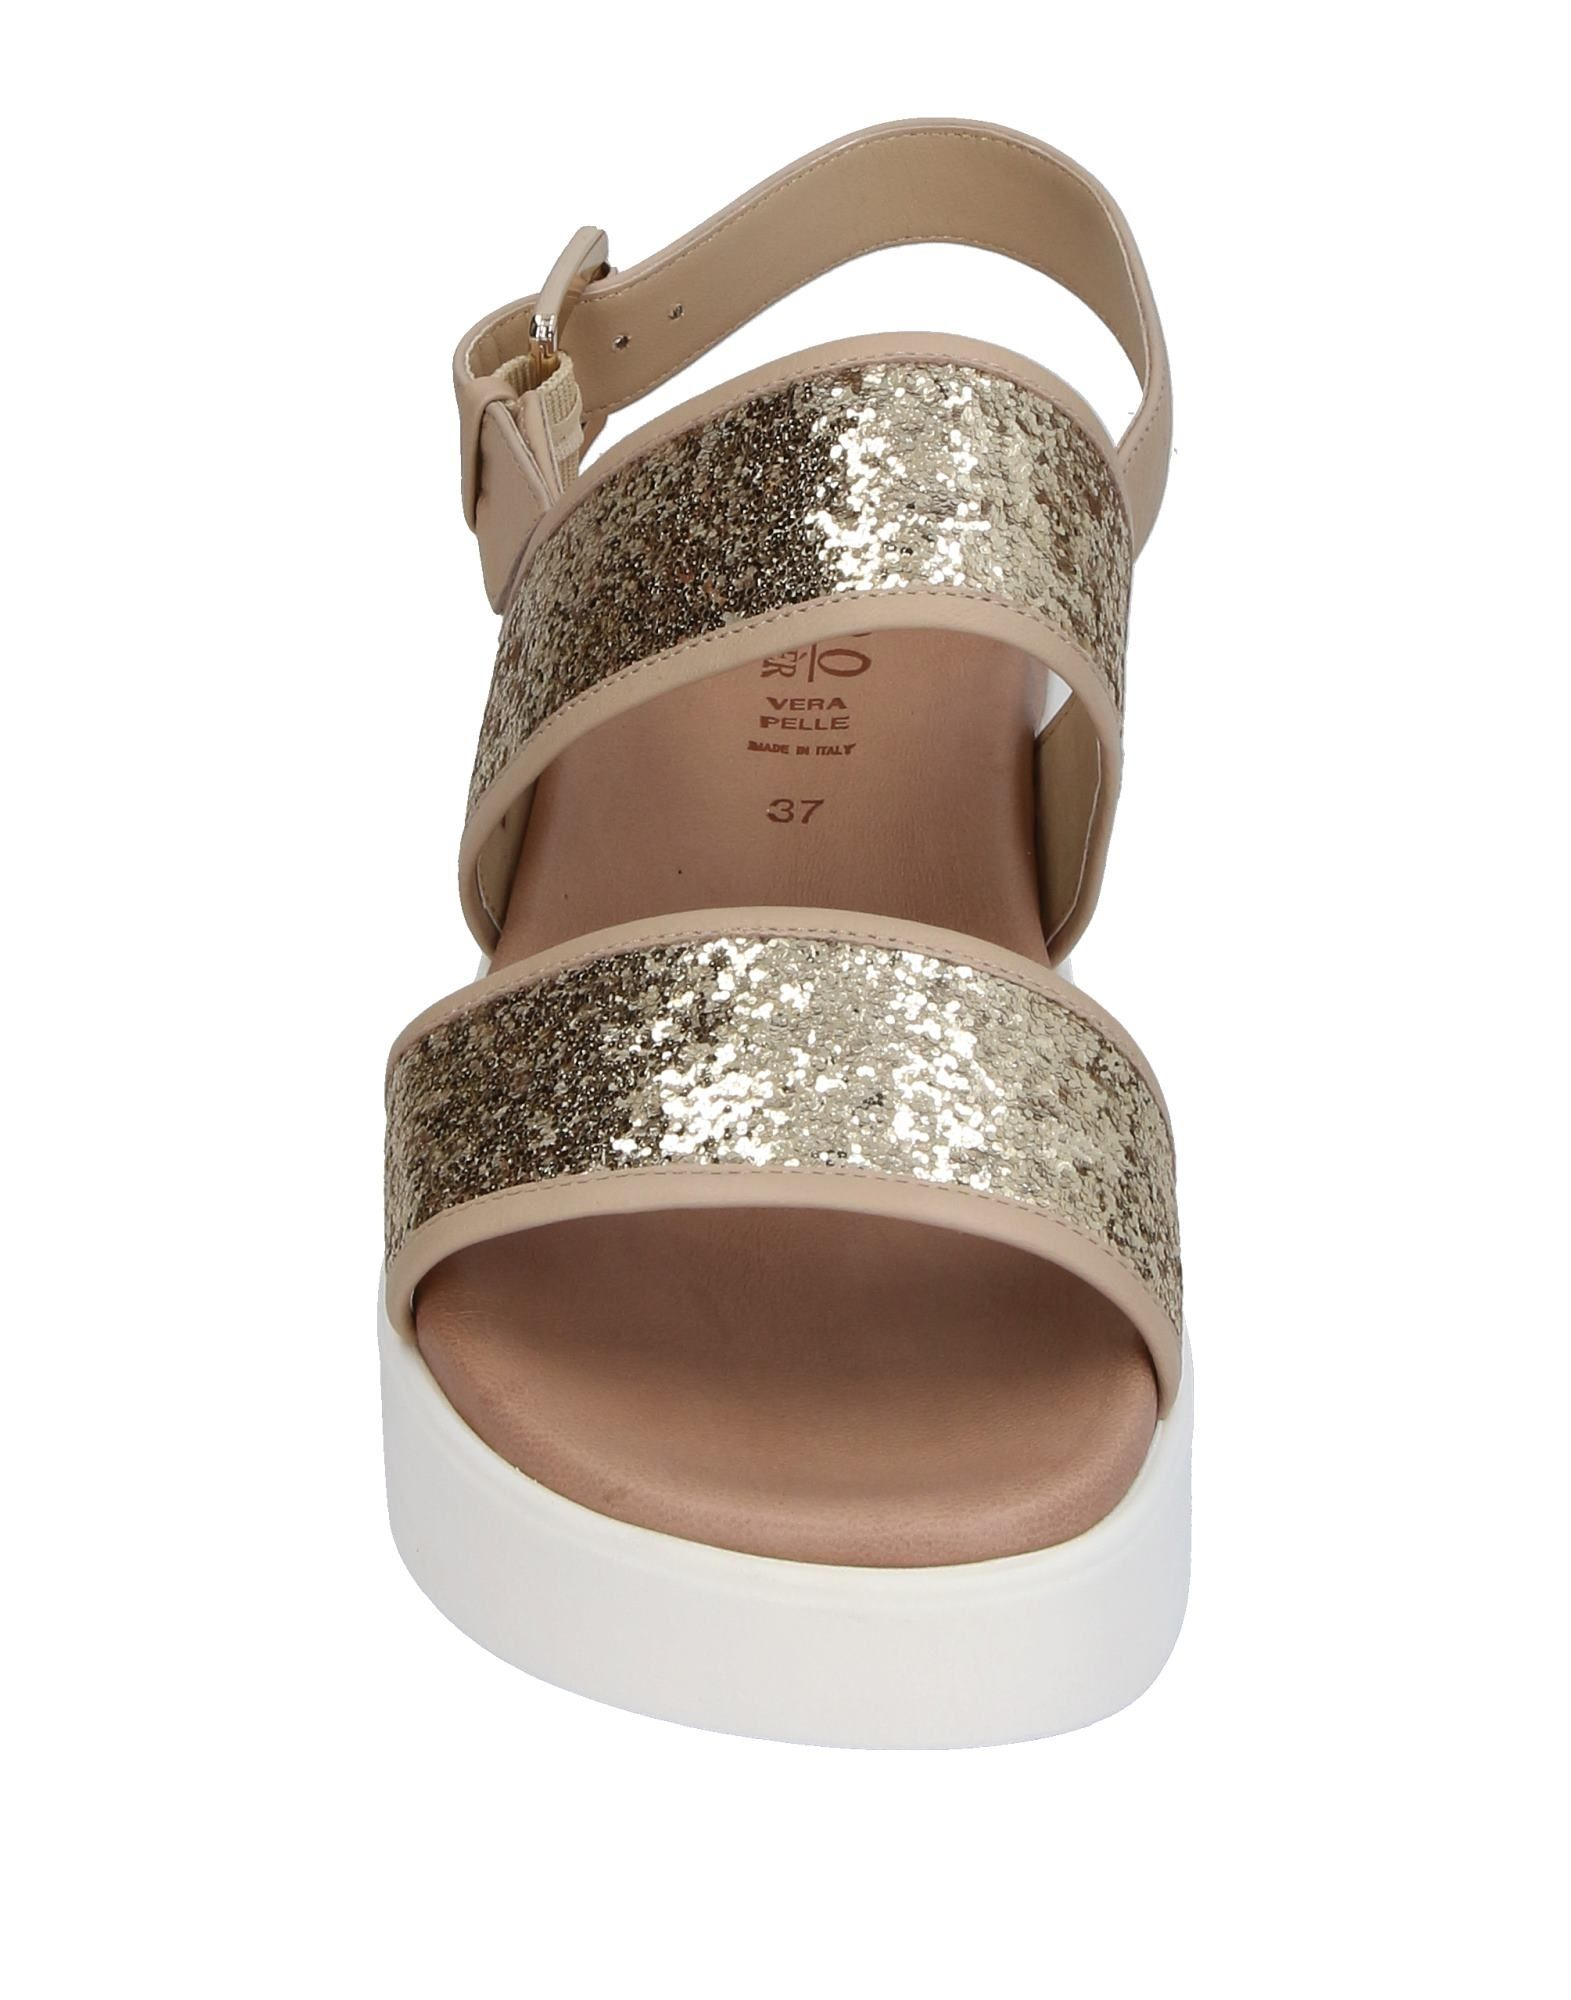 Phil Gatièr By Repo Sandalen Schuhe Damen  11394961BH Heiße Schuhe Sandalen d8ea8c